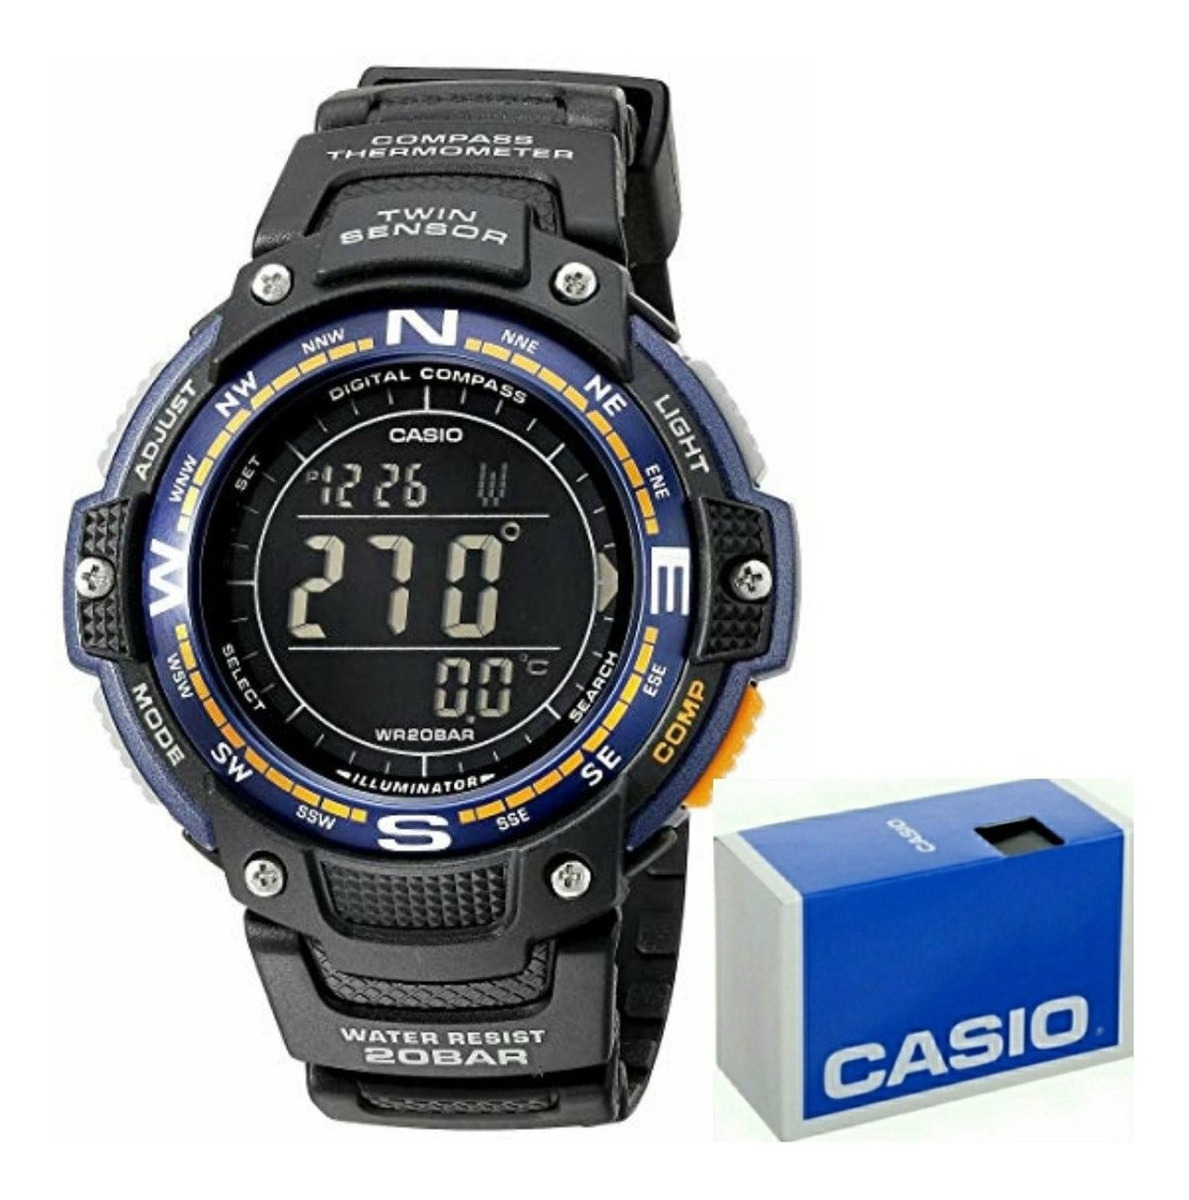 Termomet Reloj Brujula Digital Cronometro Sgw100 Negro Casio LjqGSzVpUM